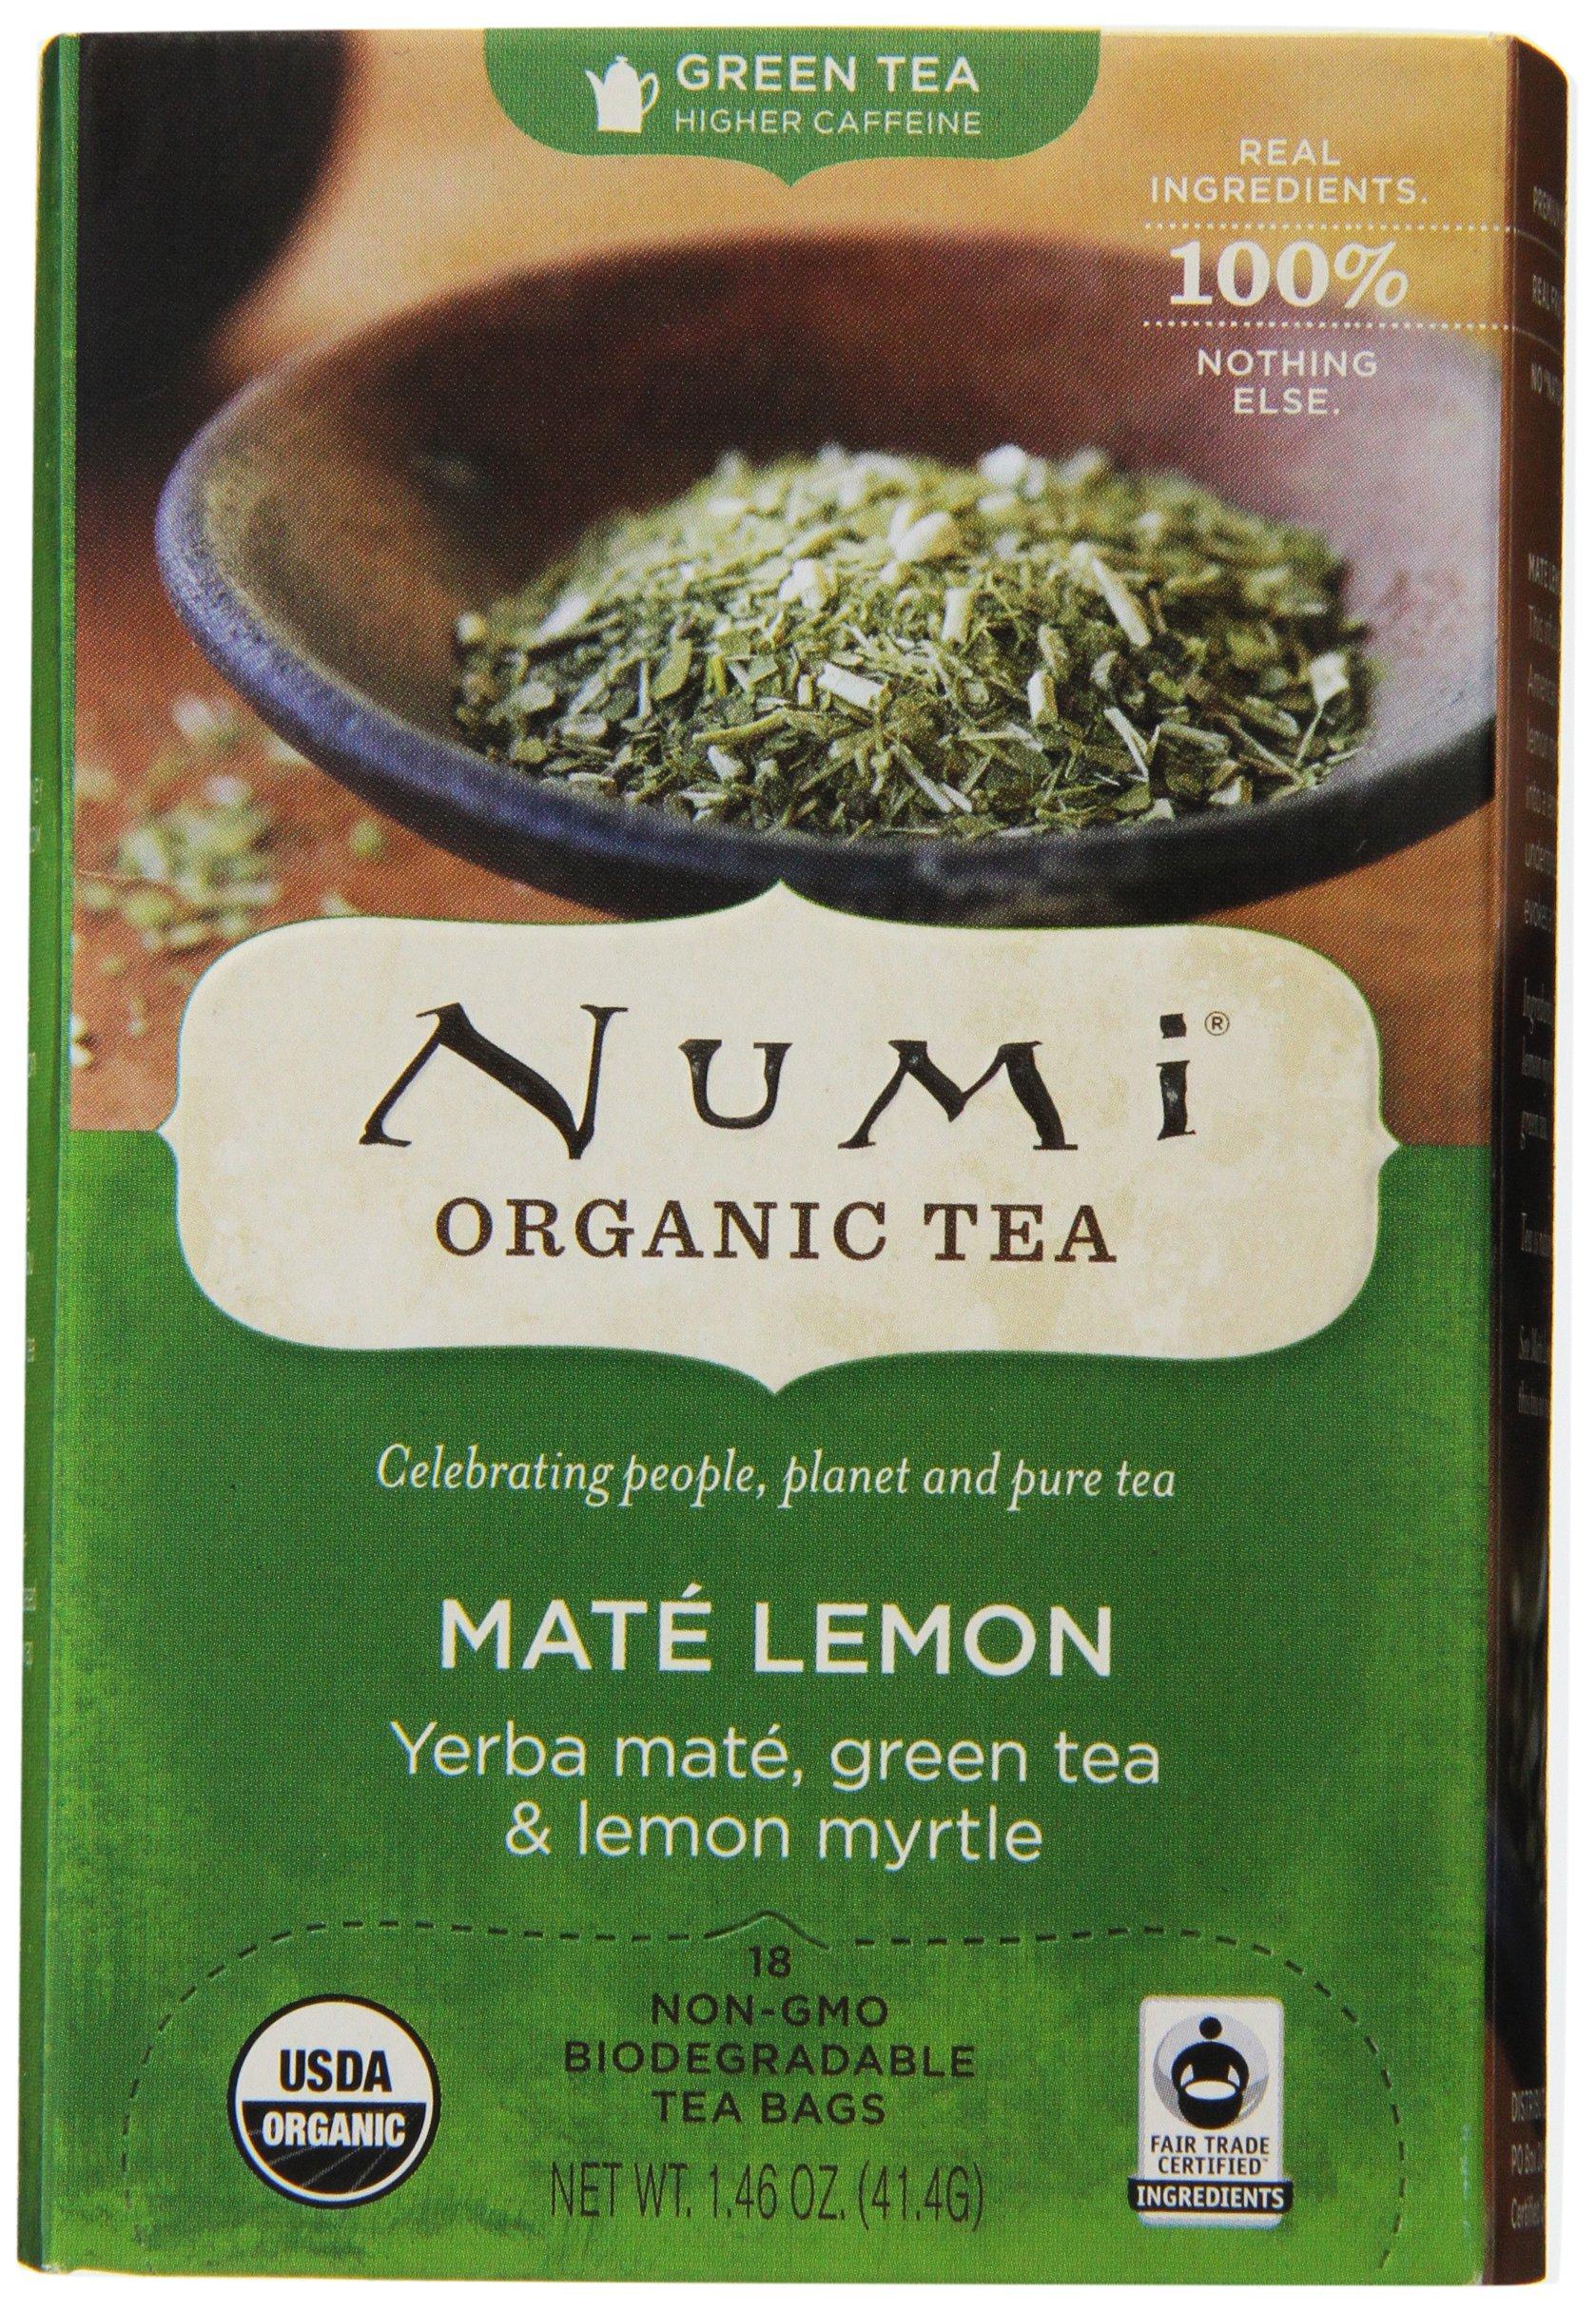 Numi Organic Tea--Lemon Yerba Mate Green Tea & Lemon Myrtle--18 Count Non-GMO Biodegradable Tea Bags--Premium Organic Tea